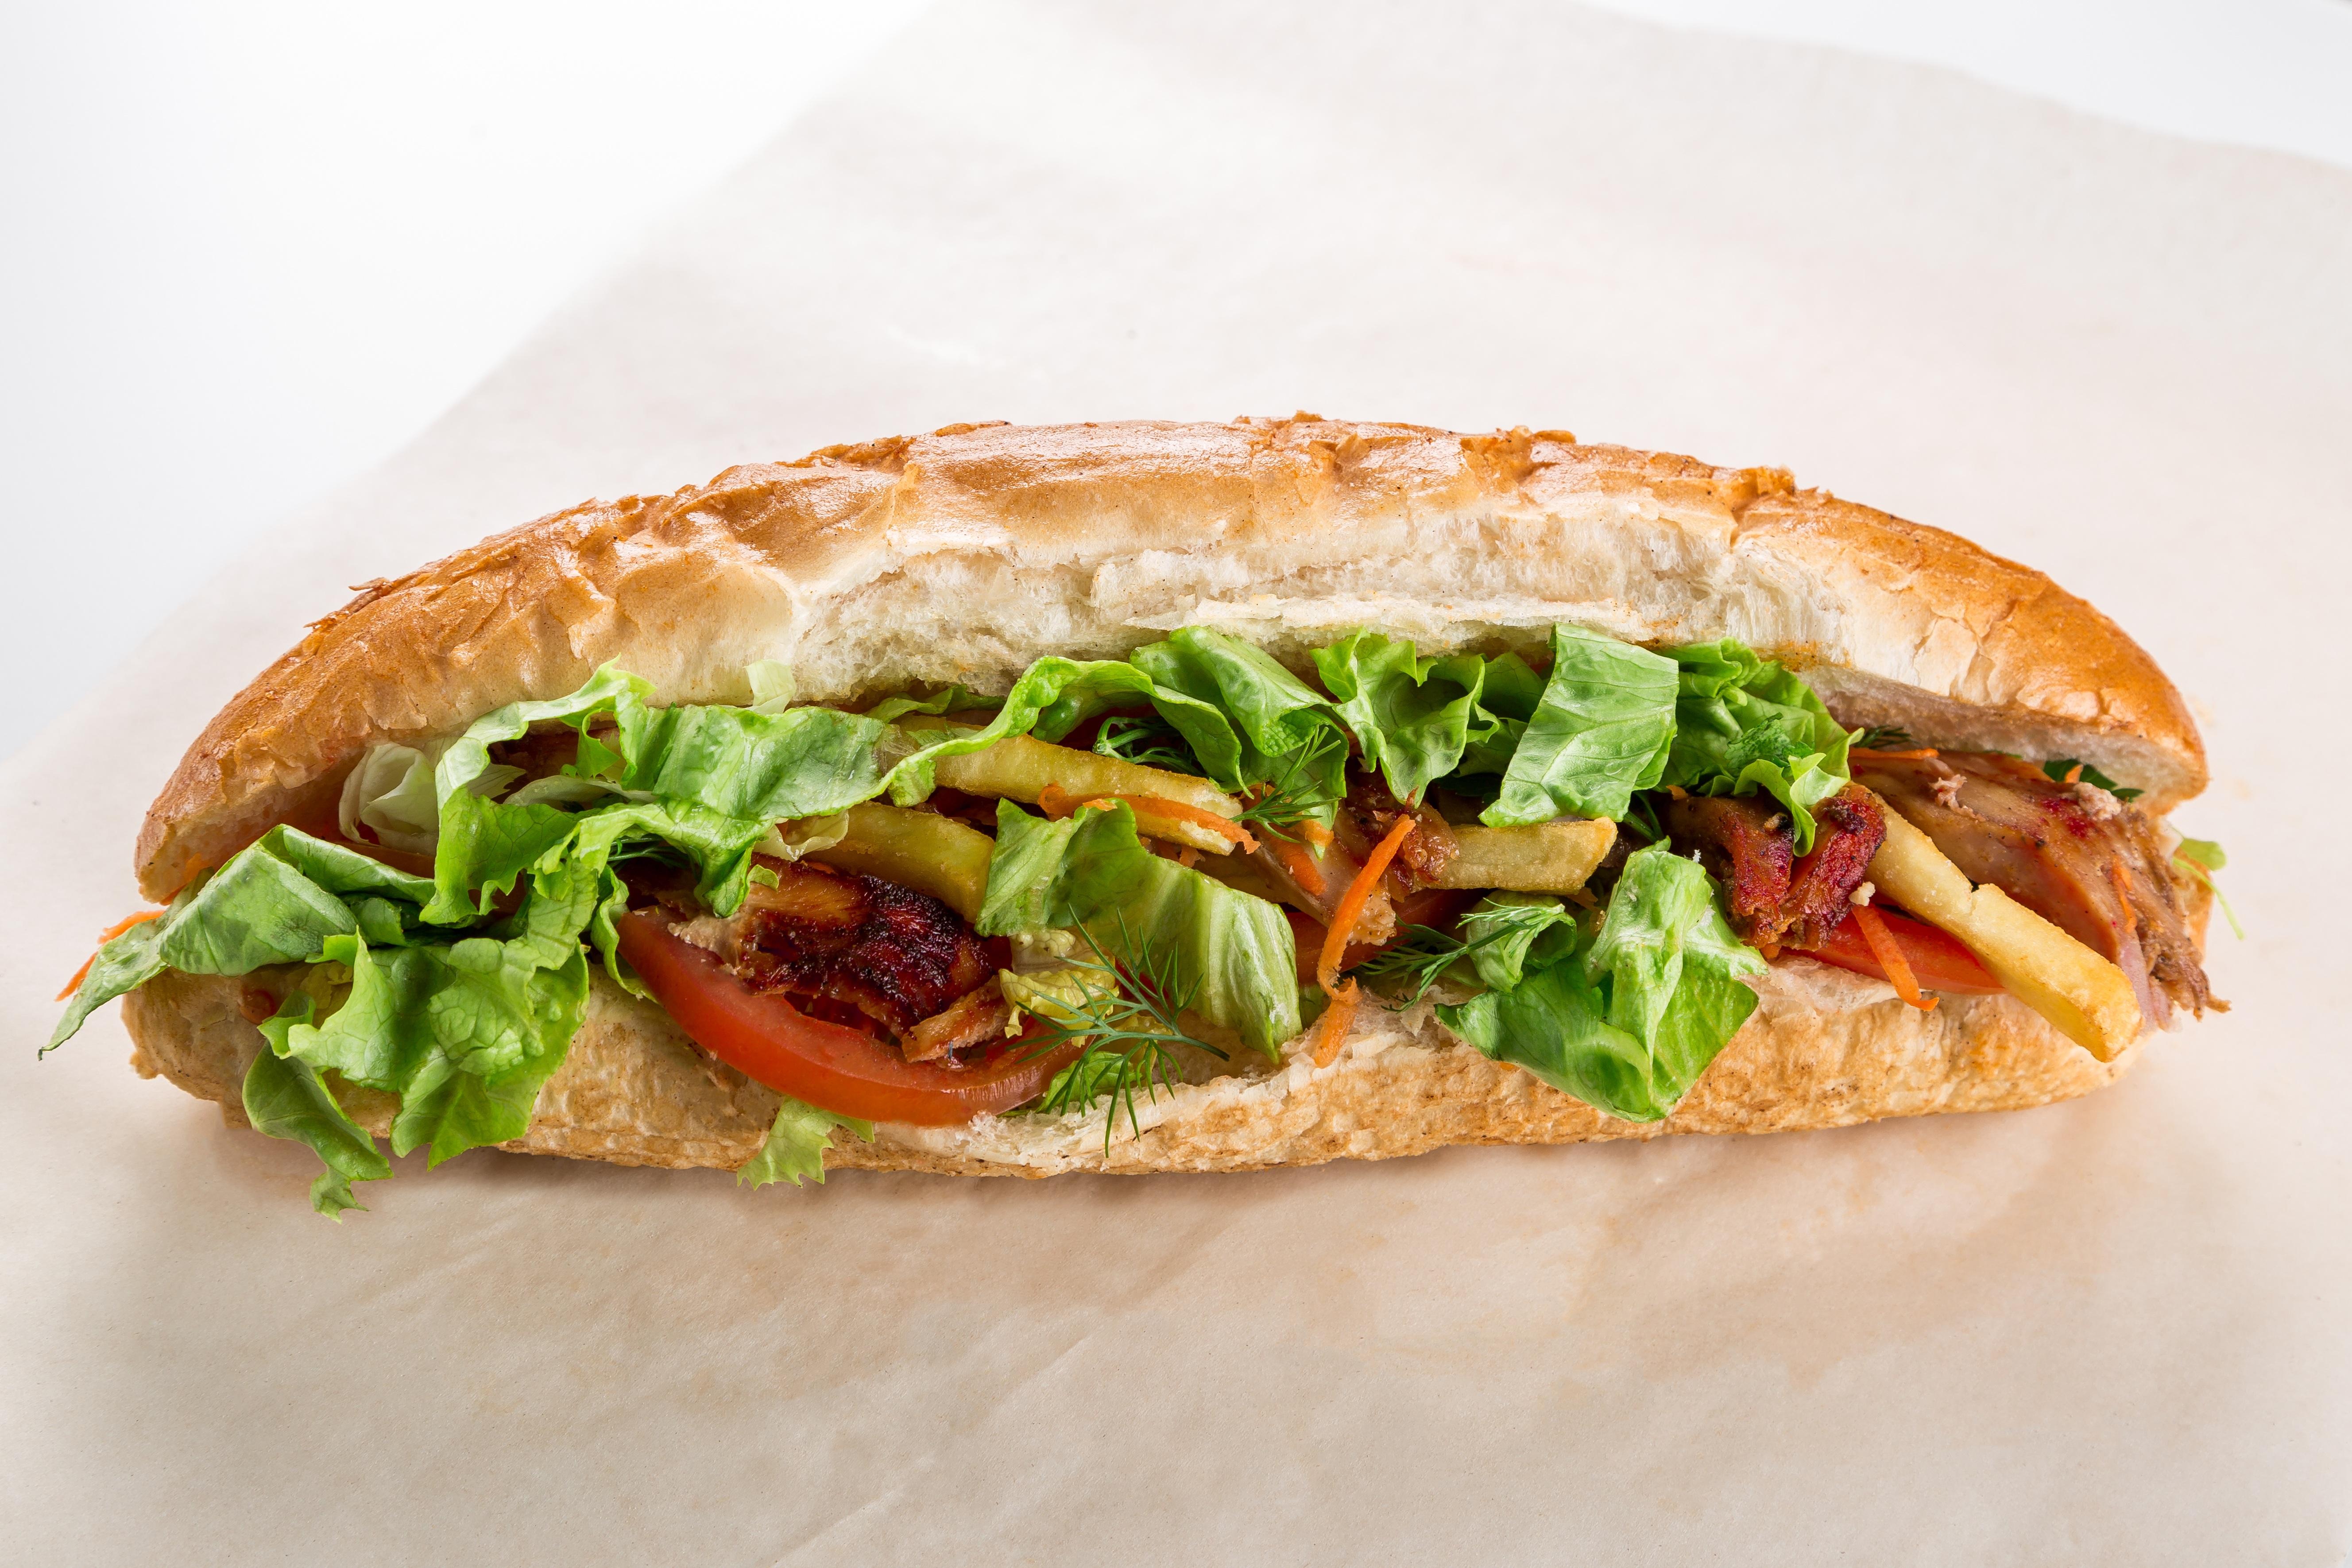 free images dish meal produce snack fast food meat cuisine bread hamburger nutrition. Black Bedroom Furniture Sets. Home Design Ideas